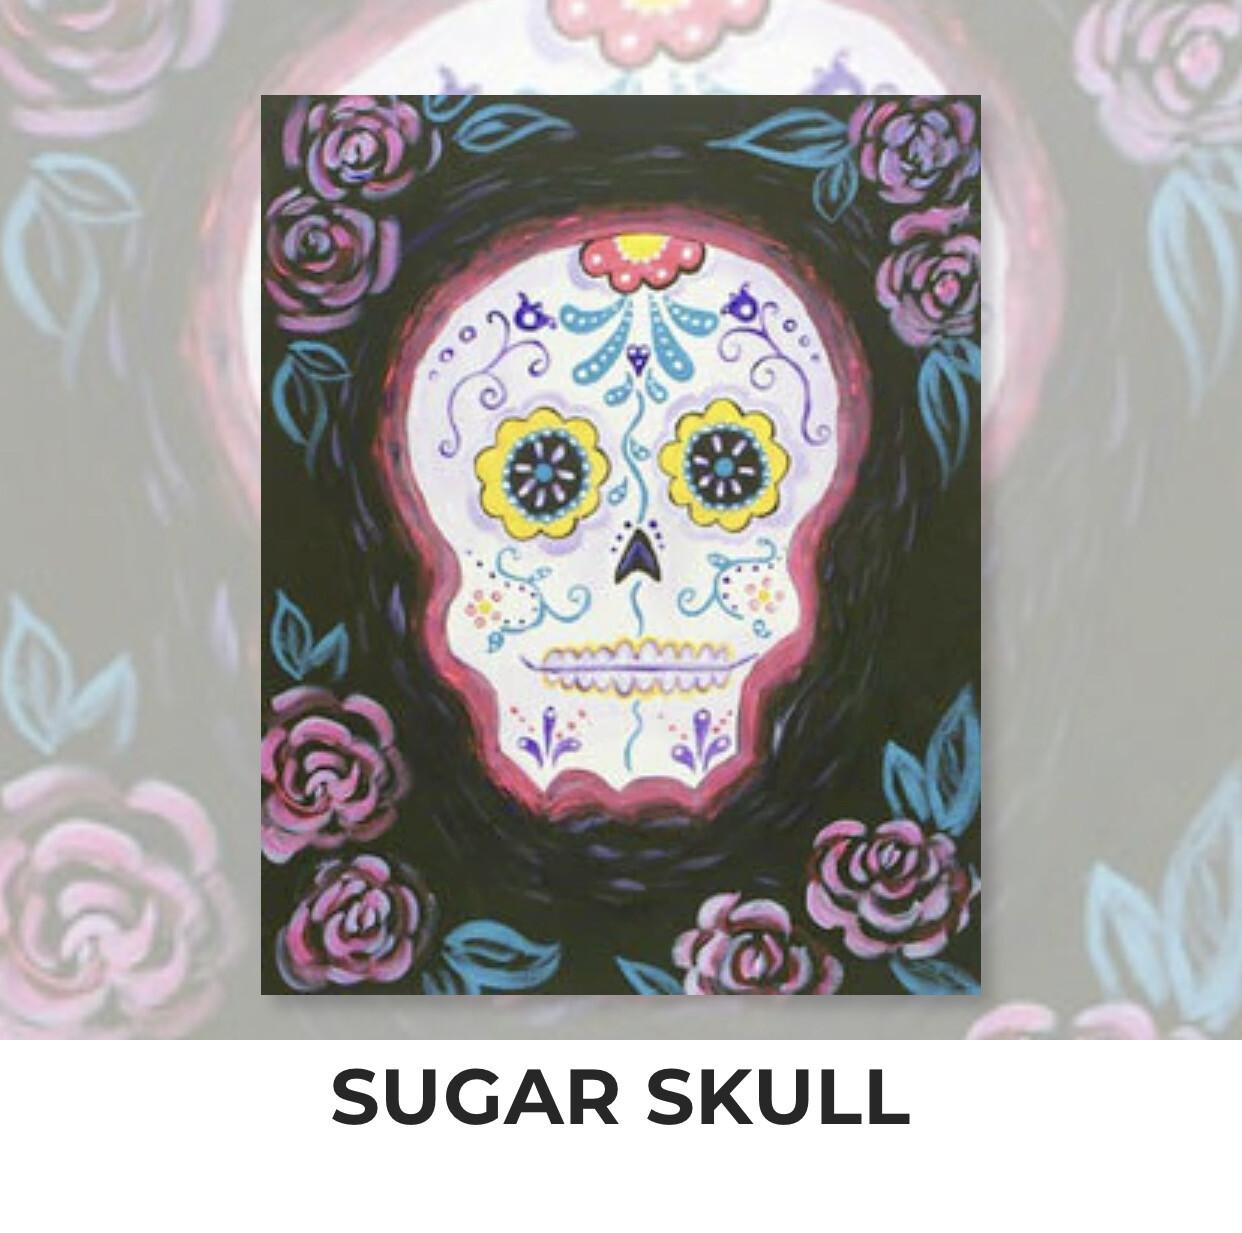 Sugar Skull ADULT Acrylic Paint On Canvas DIY Art Kit - 3 Week Special Order